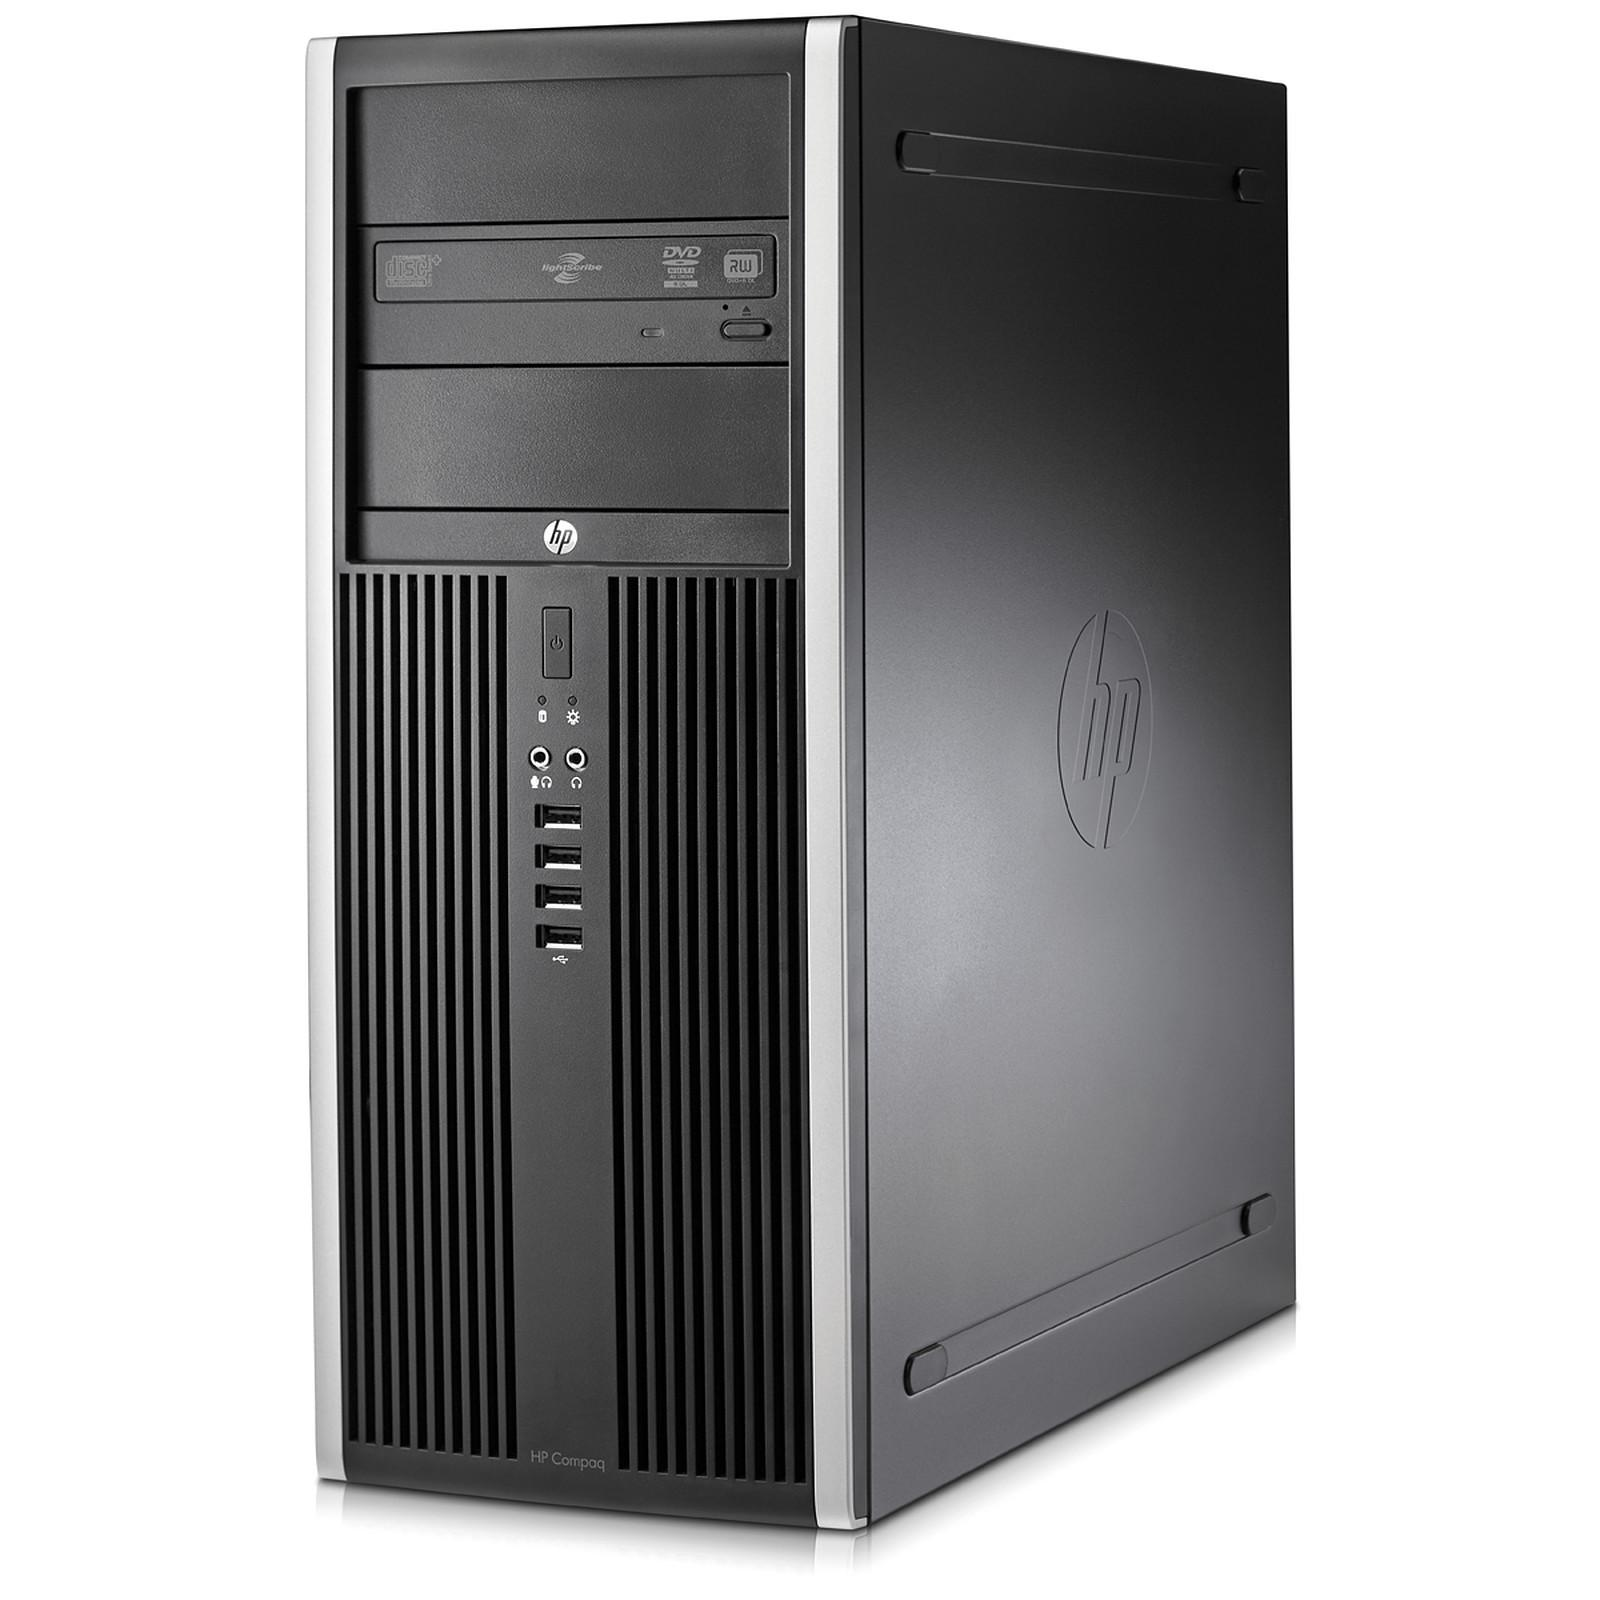 HP Compaq 8200 Elite MT Core i7 3,4 GHz - HDD 2 To RAM 8 Go